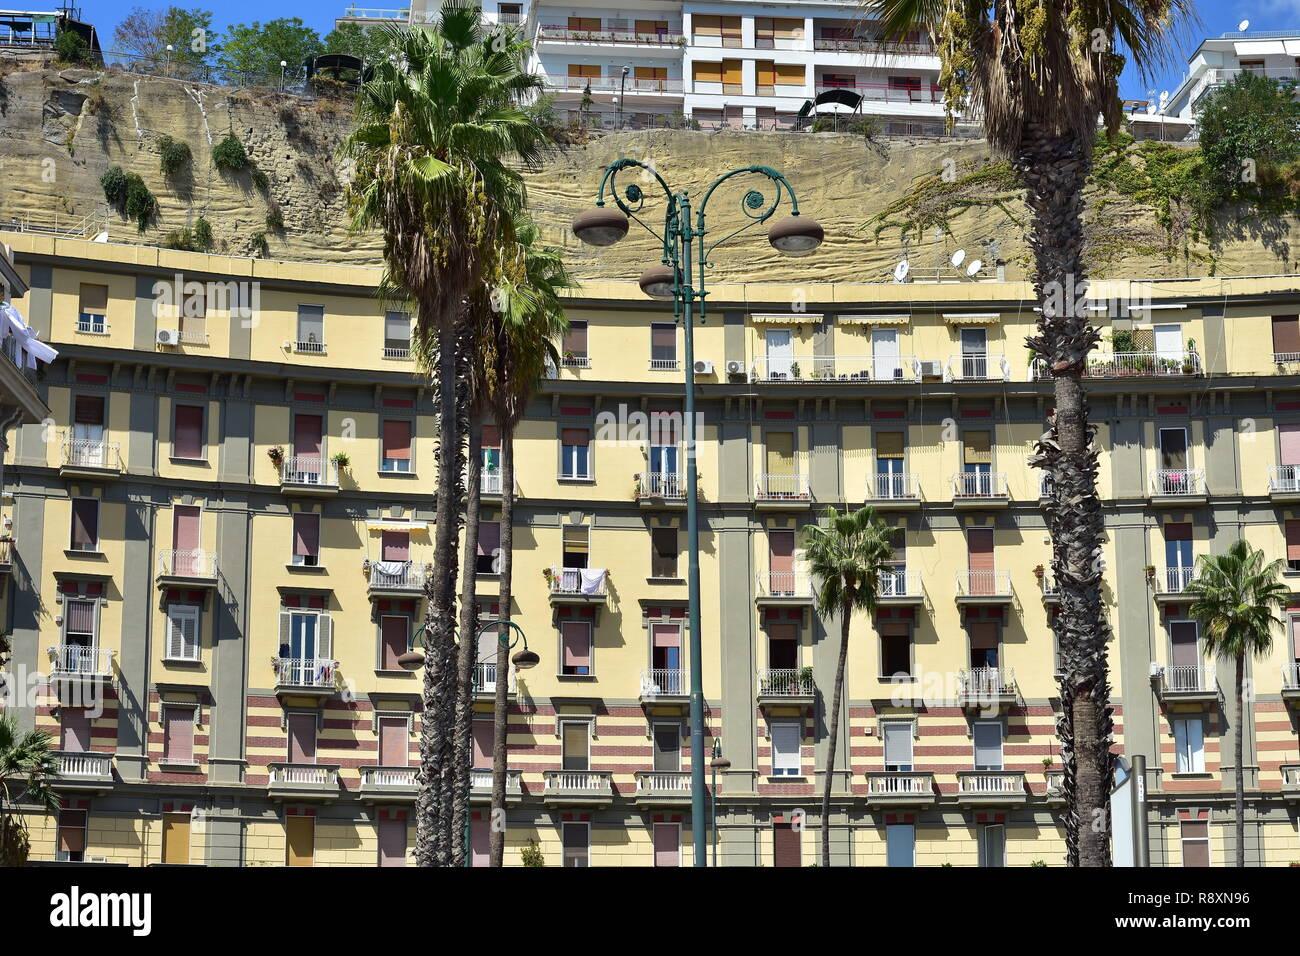 Balconi Piccolissimi : Naples street residential immagini & naples street residential fotos